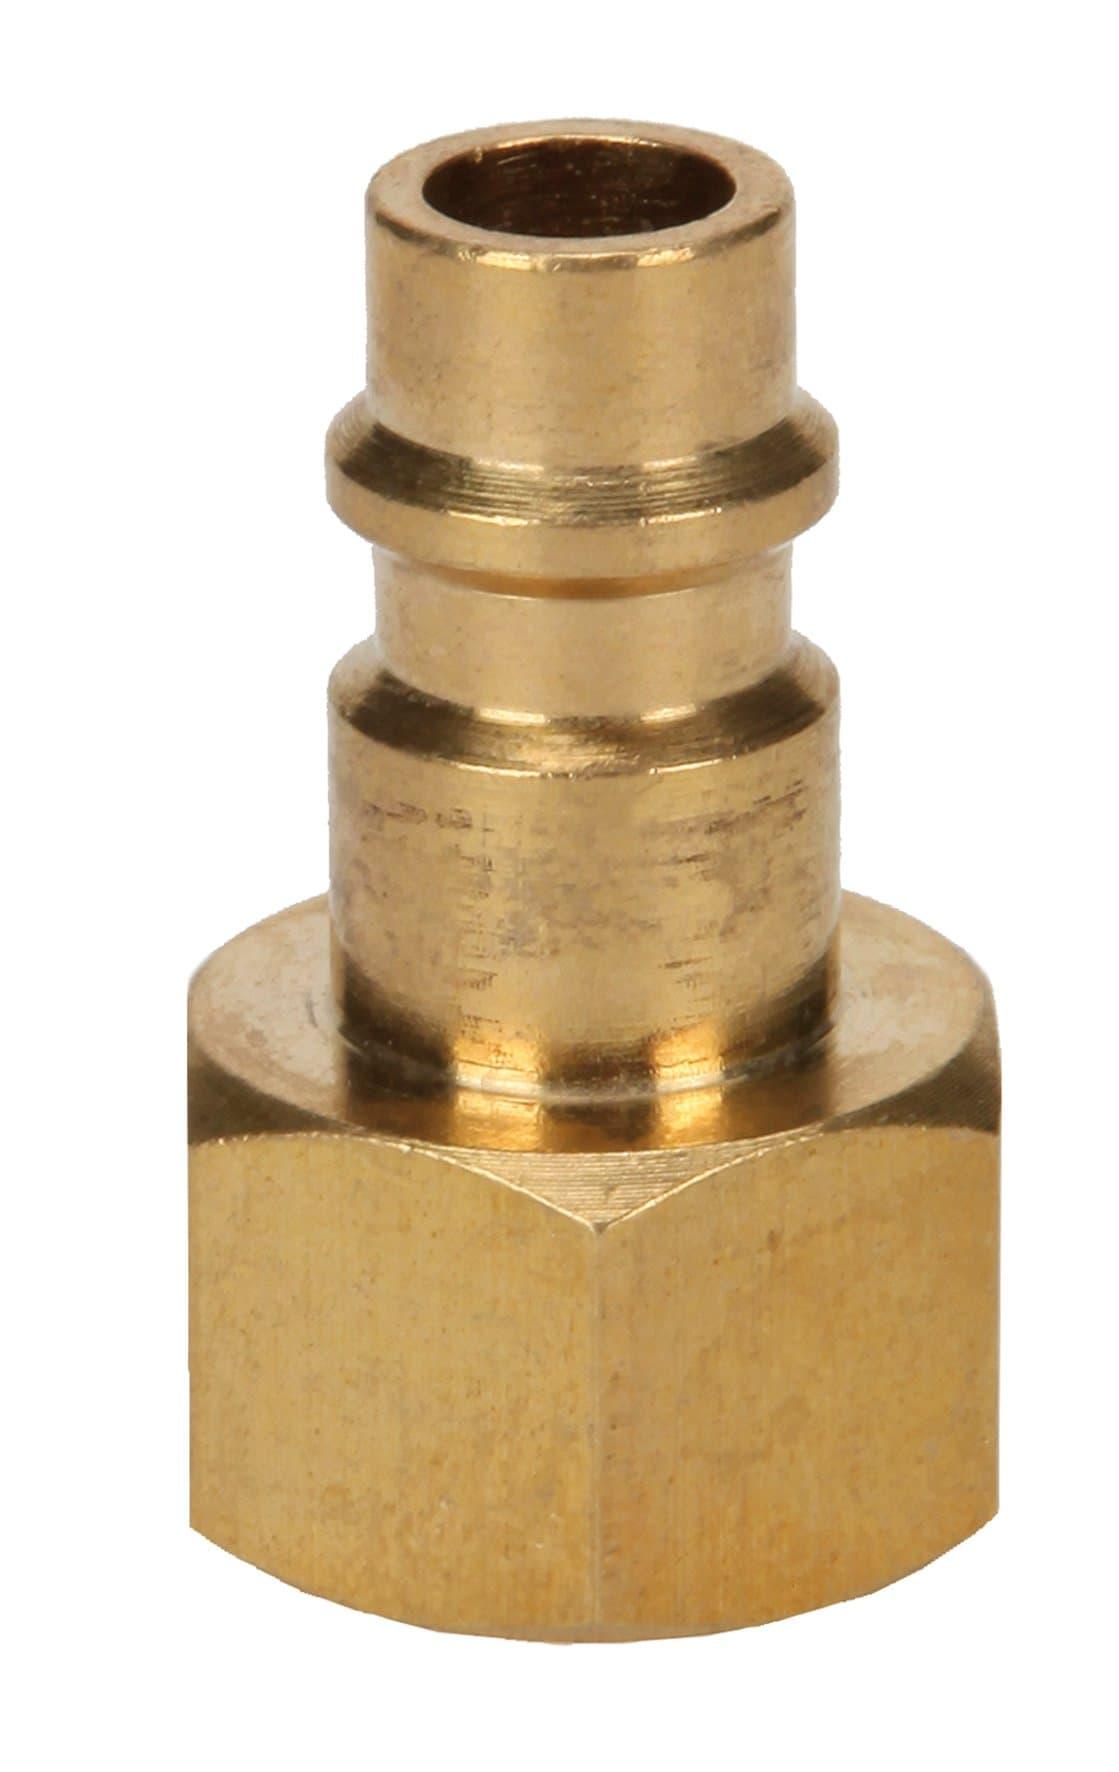 Einhell adaptateur male R3/8 IG Raccords